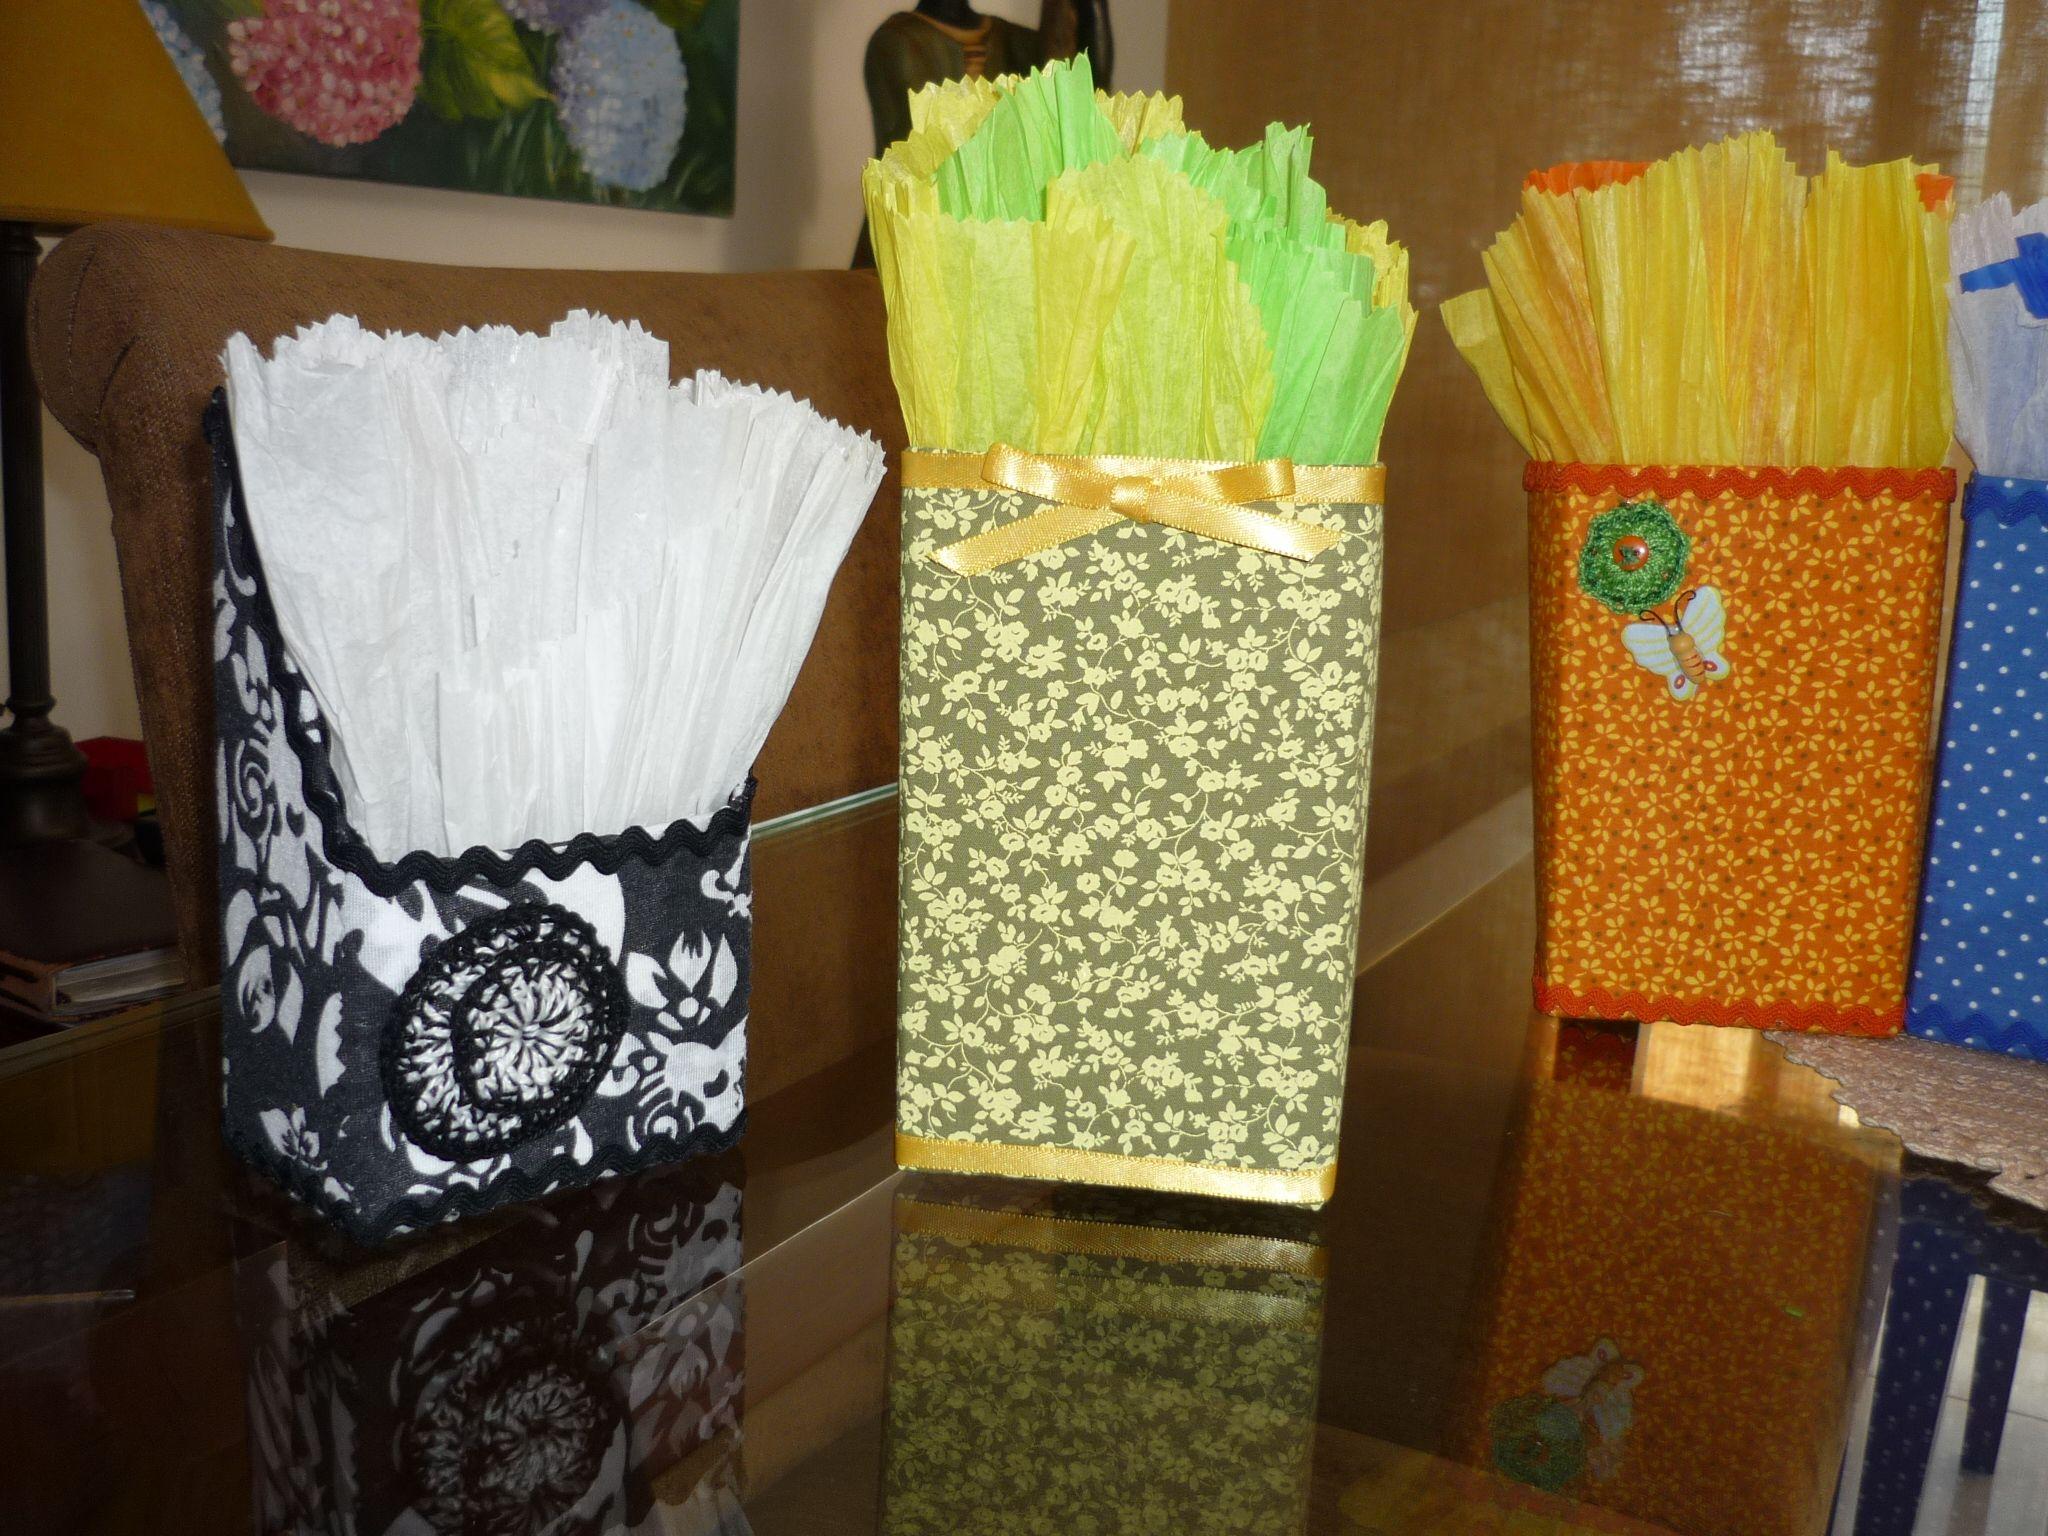 Reciclando cajas de leche manualidades pinterest - Cajas para manualidades ...